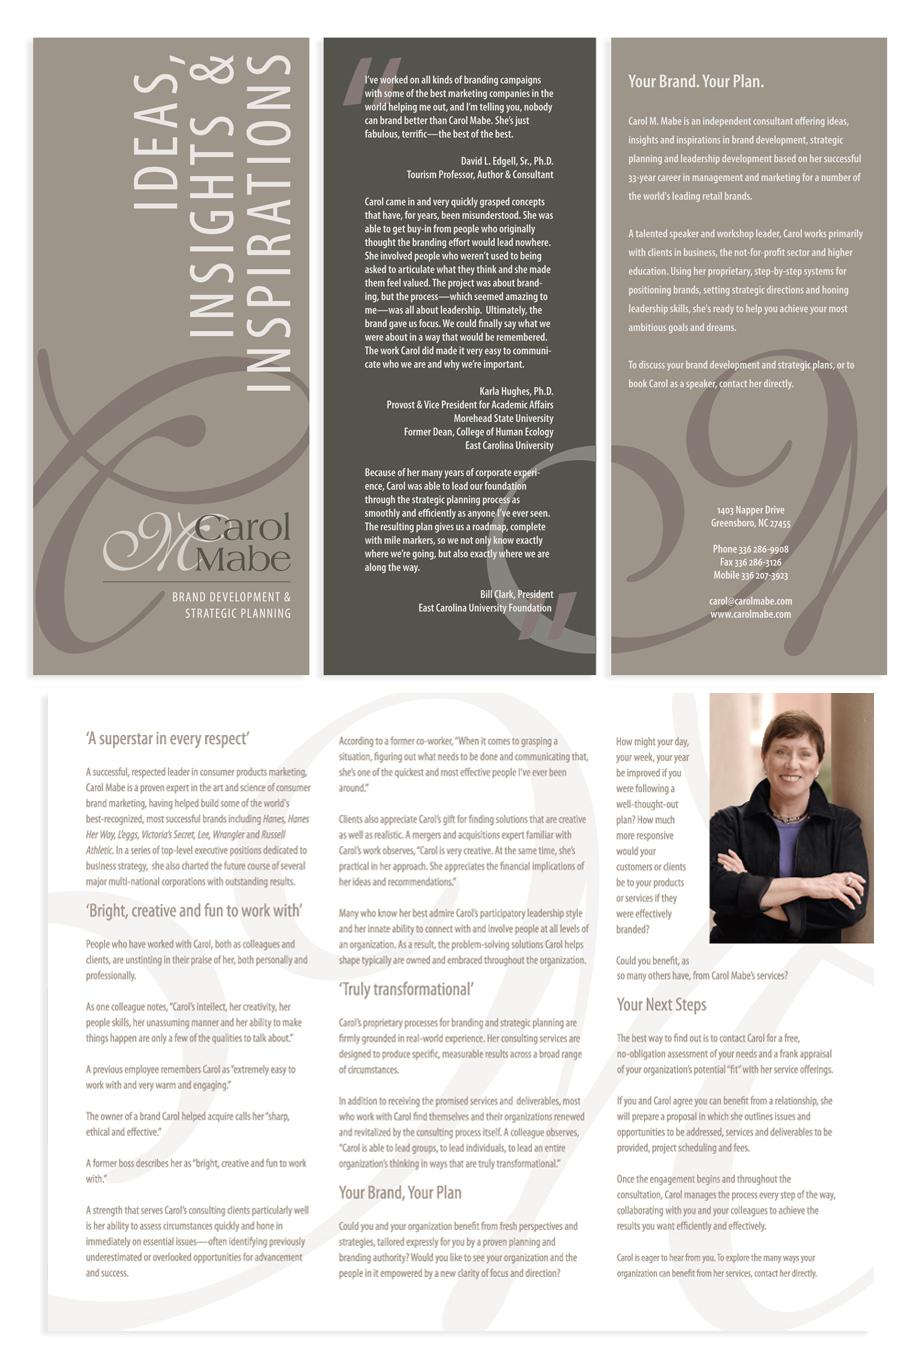 Carol Mabe's Ideas, Insights & Inspirations brochure